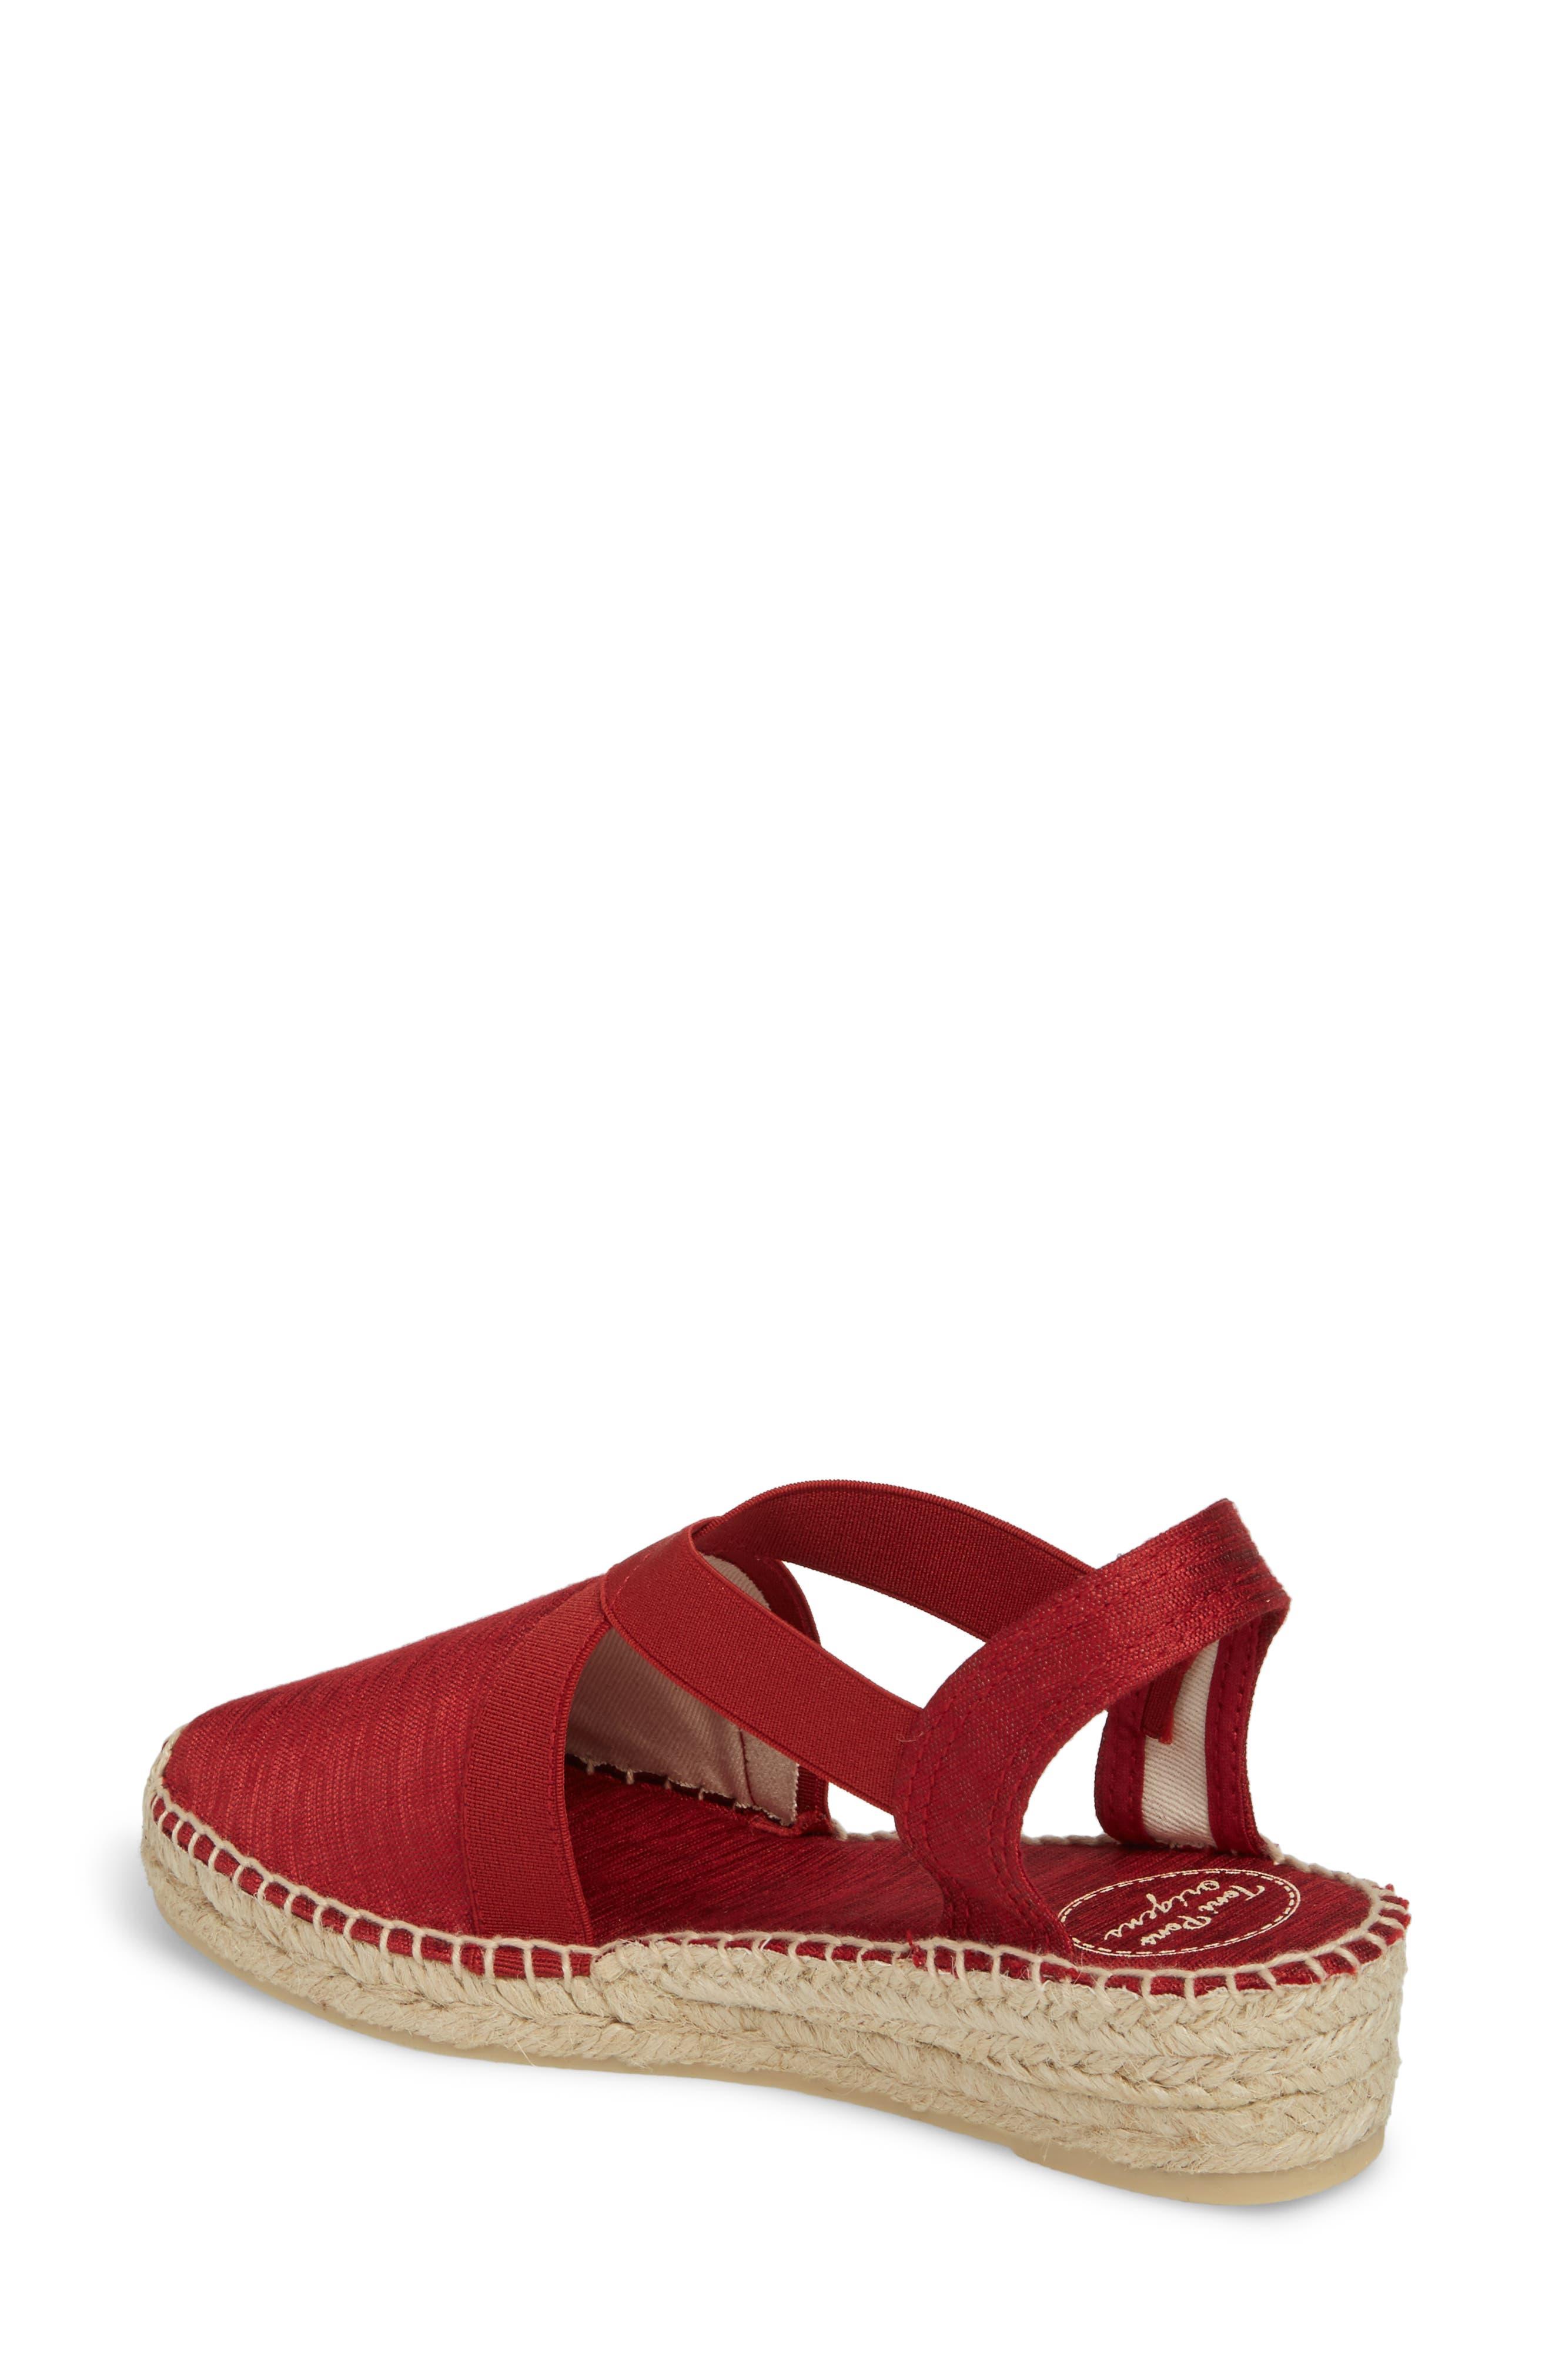 'Vic' Espadrille Slingback Sandal,                             Alternate thumbnail 2, color,                             Red Fabric